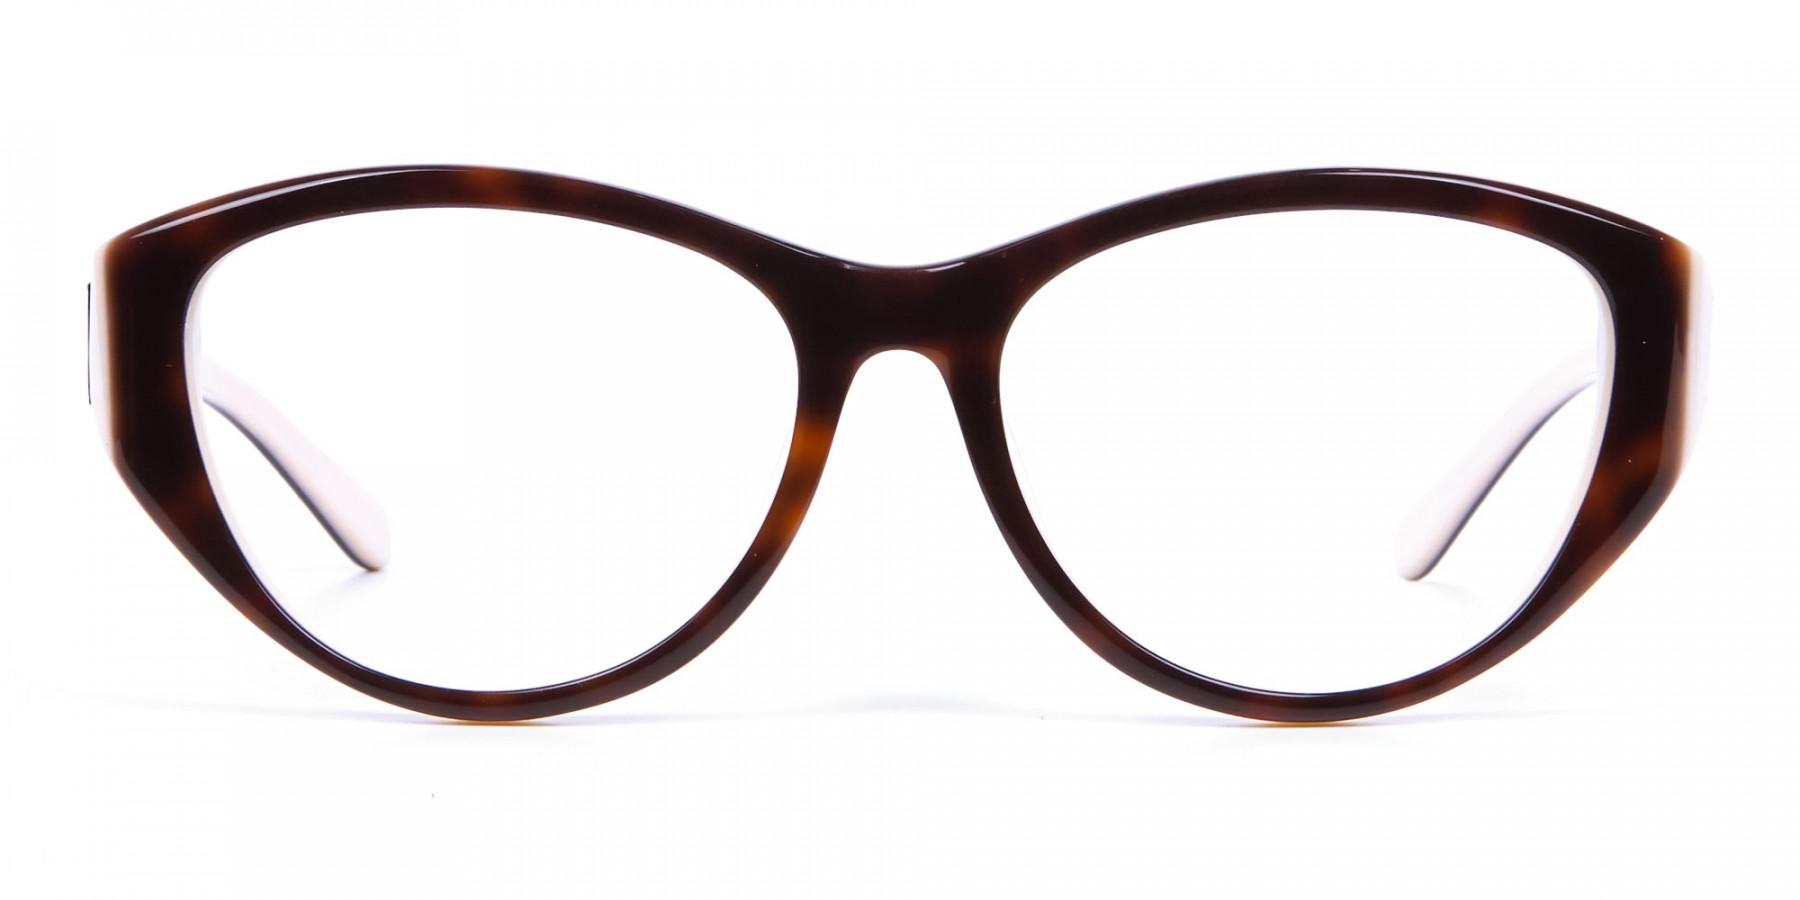 Woman's Tortoiseshell & Havana Glasses